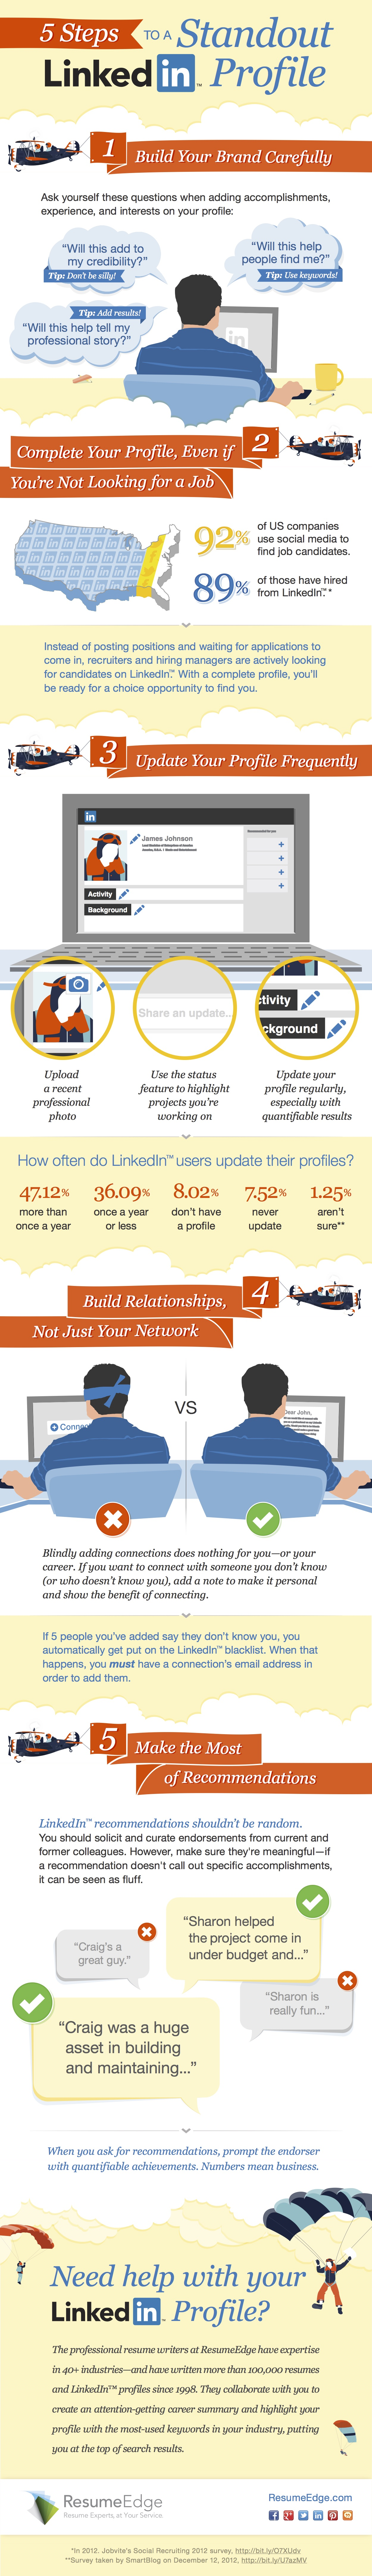 5 Steps to a Standout LinkedIn Profile